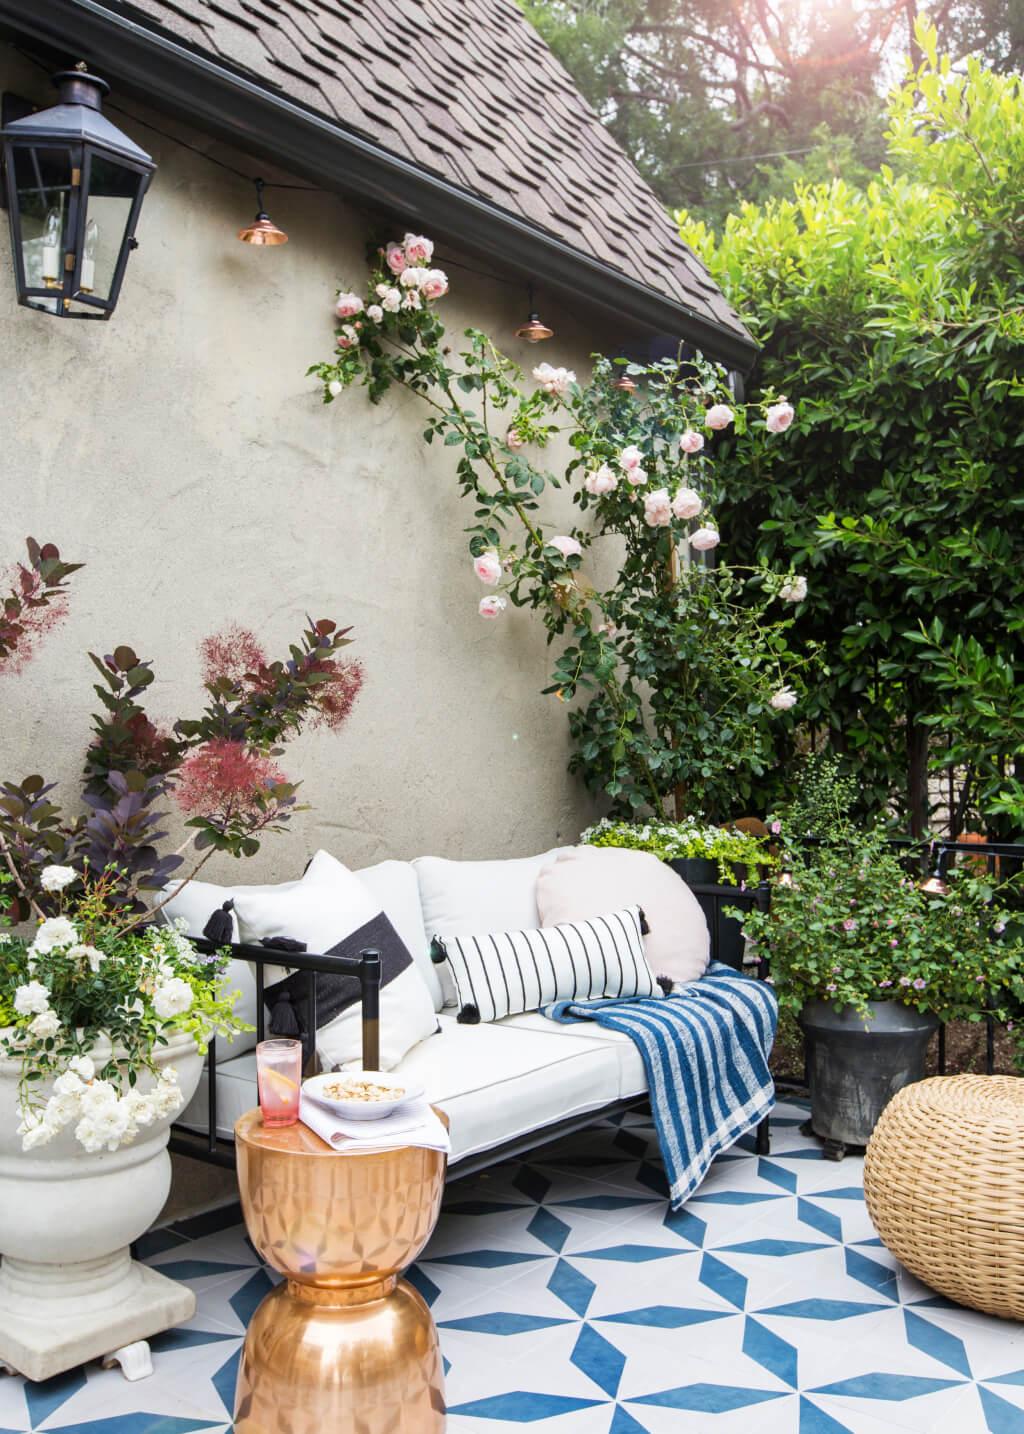 Emily-Henderson_House-Beautiful_Courtyard_Tile_Modern_English_Country_2-1024x1434.jpg